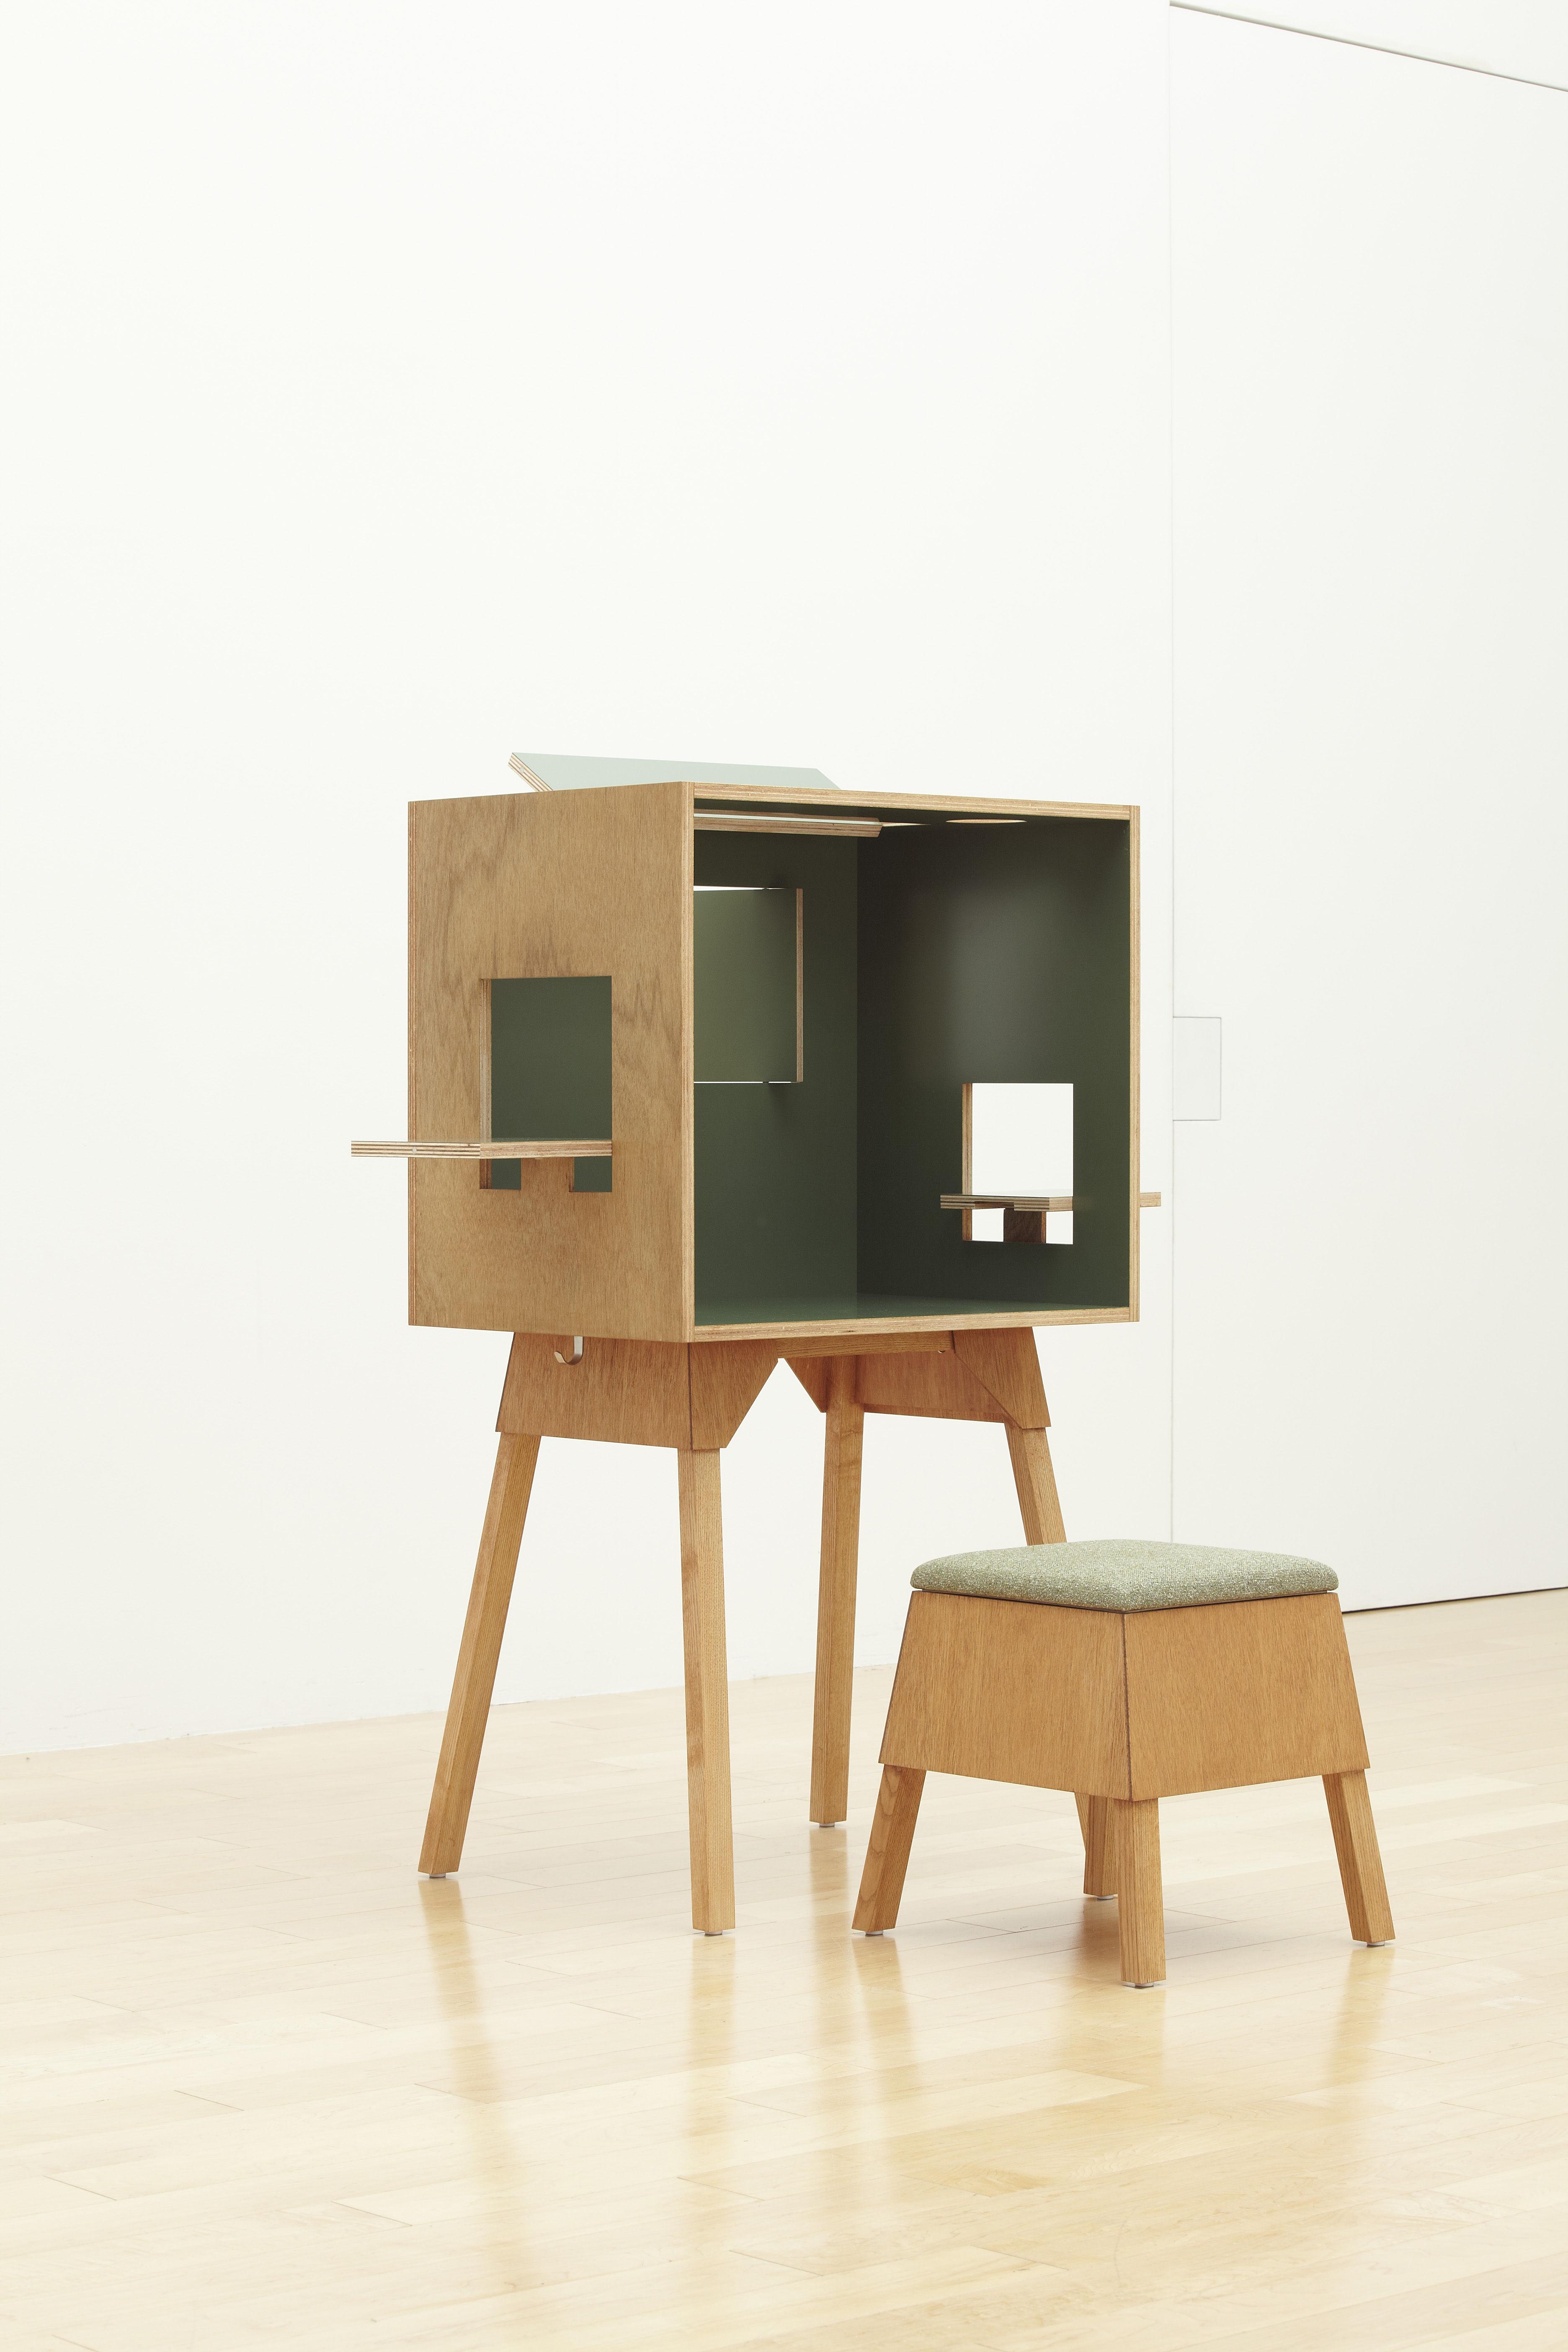 Bureau koloro l 73 cm vert fonc bois clair ichiro - Bureau bois fonce ...